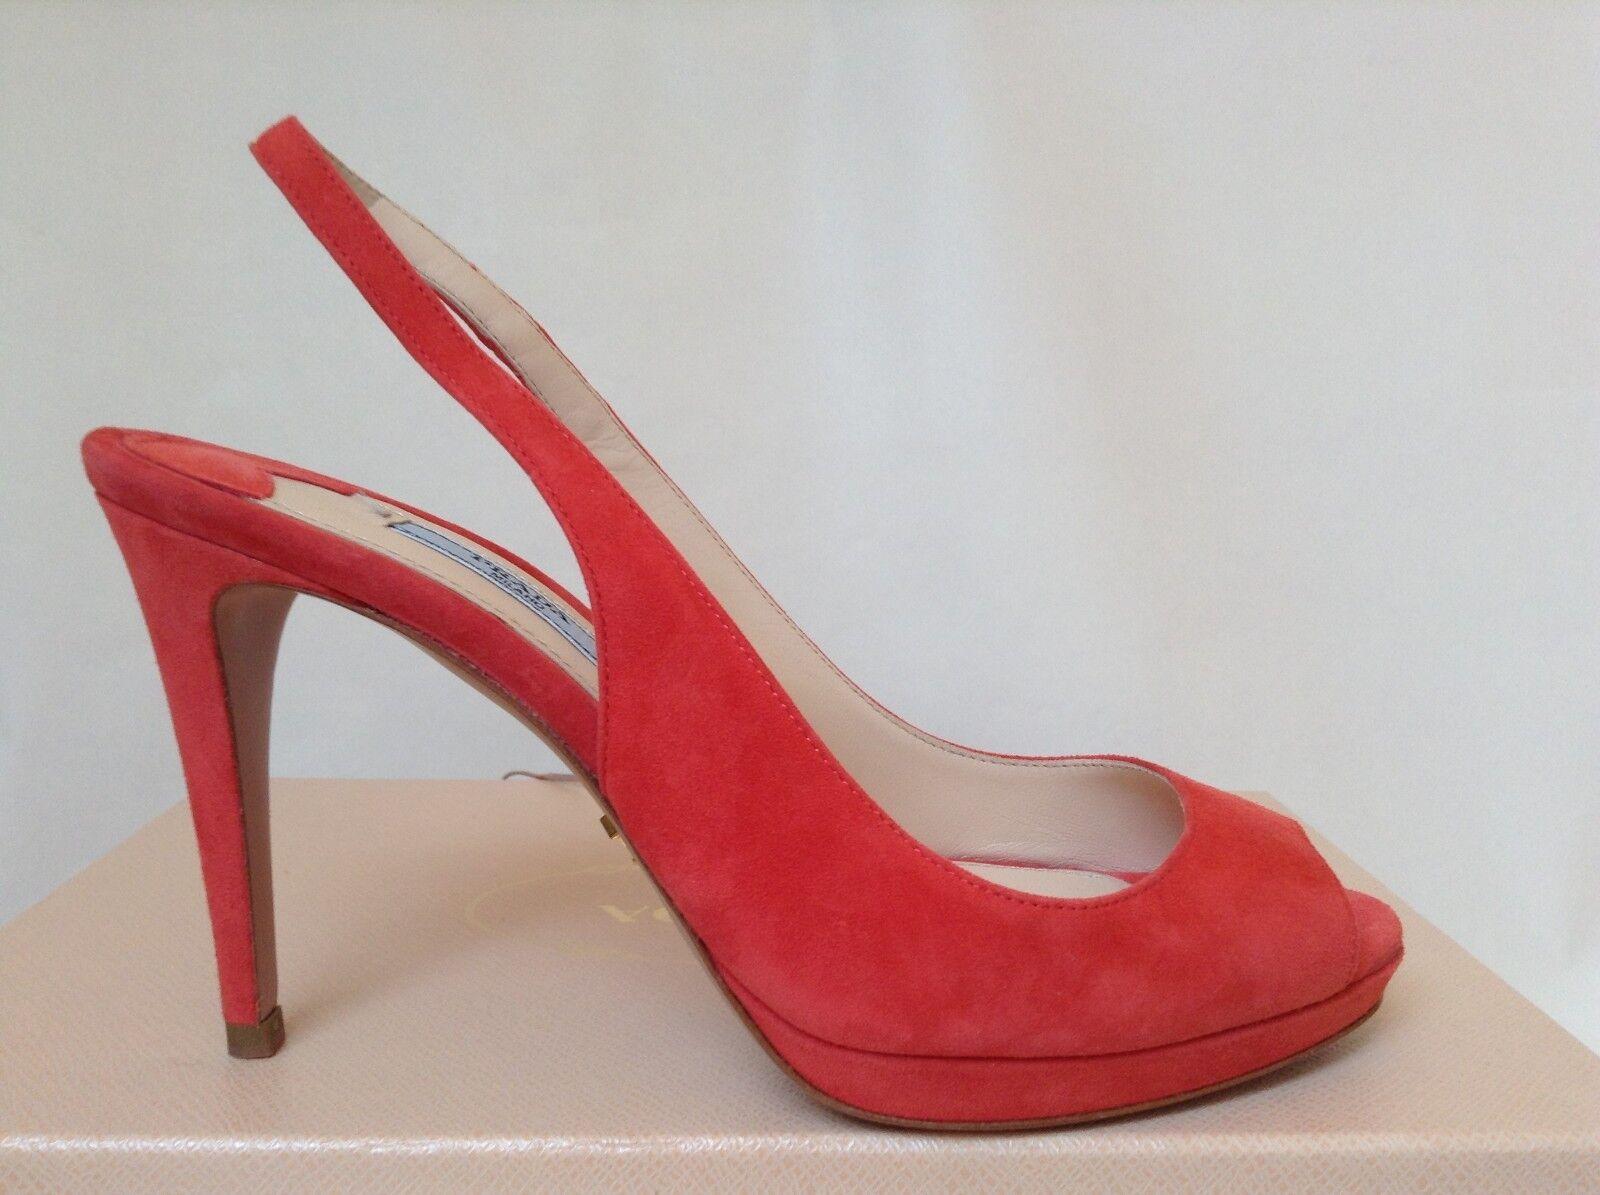 NIB PRADA Coral Nude Suede Pointed-Toe Slingback High Heel Shoes